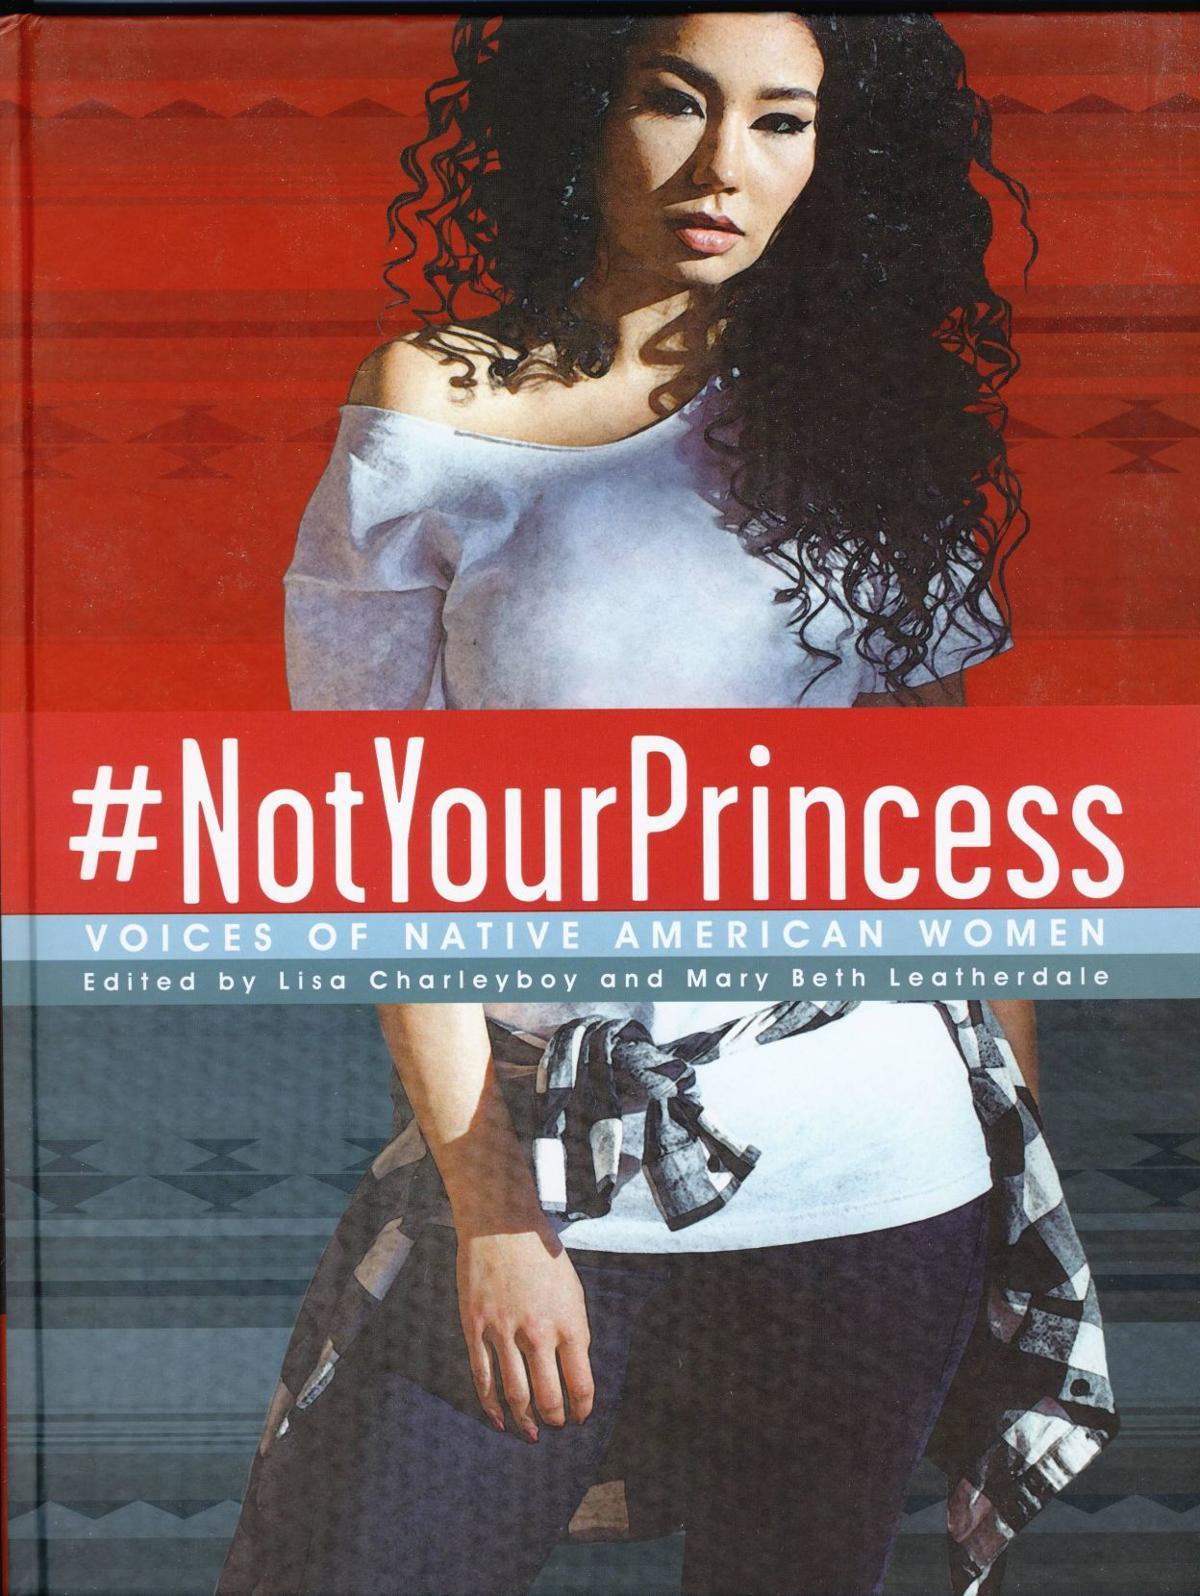 '#NotYourPrincess: Voices of Native American Women'